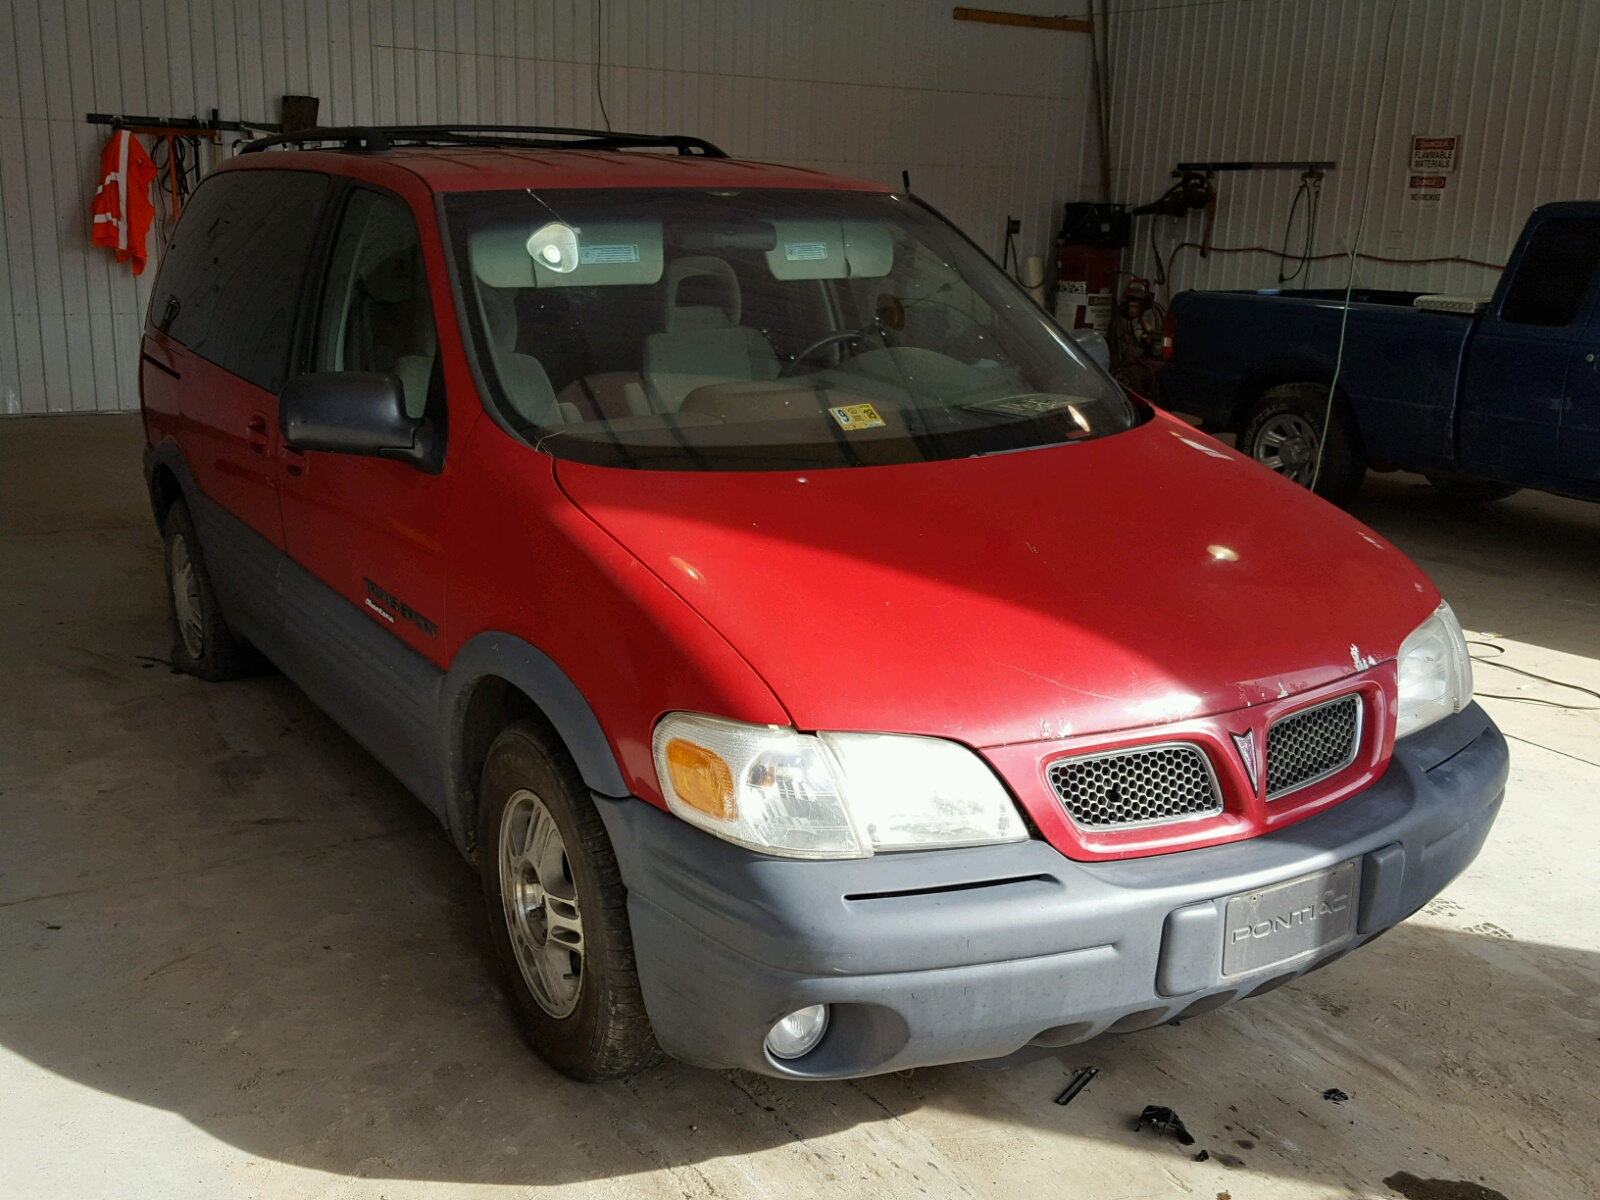 Auto Auction Ended On Vin 1g2nw12e32c139015 2002 Pontiac Grand Am 1998 Trans Spor 34l